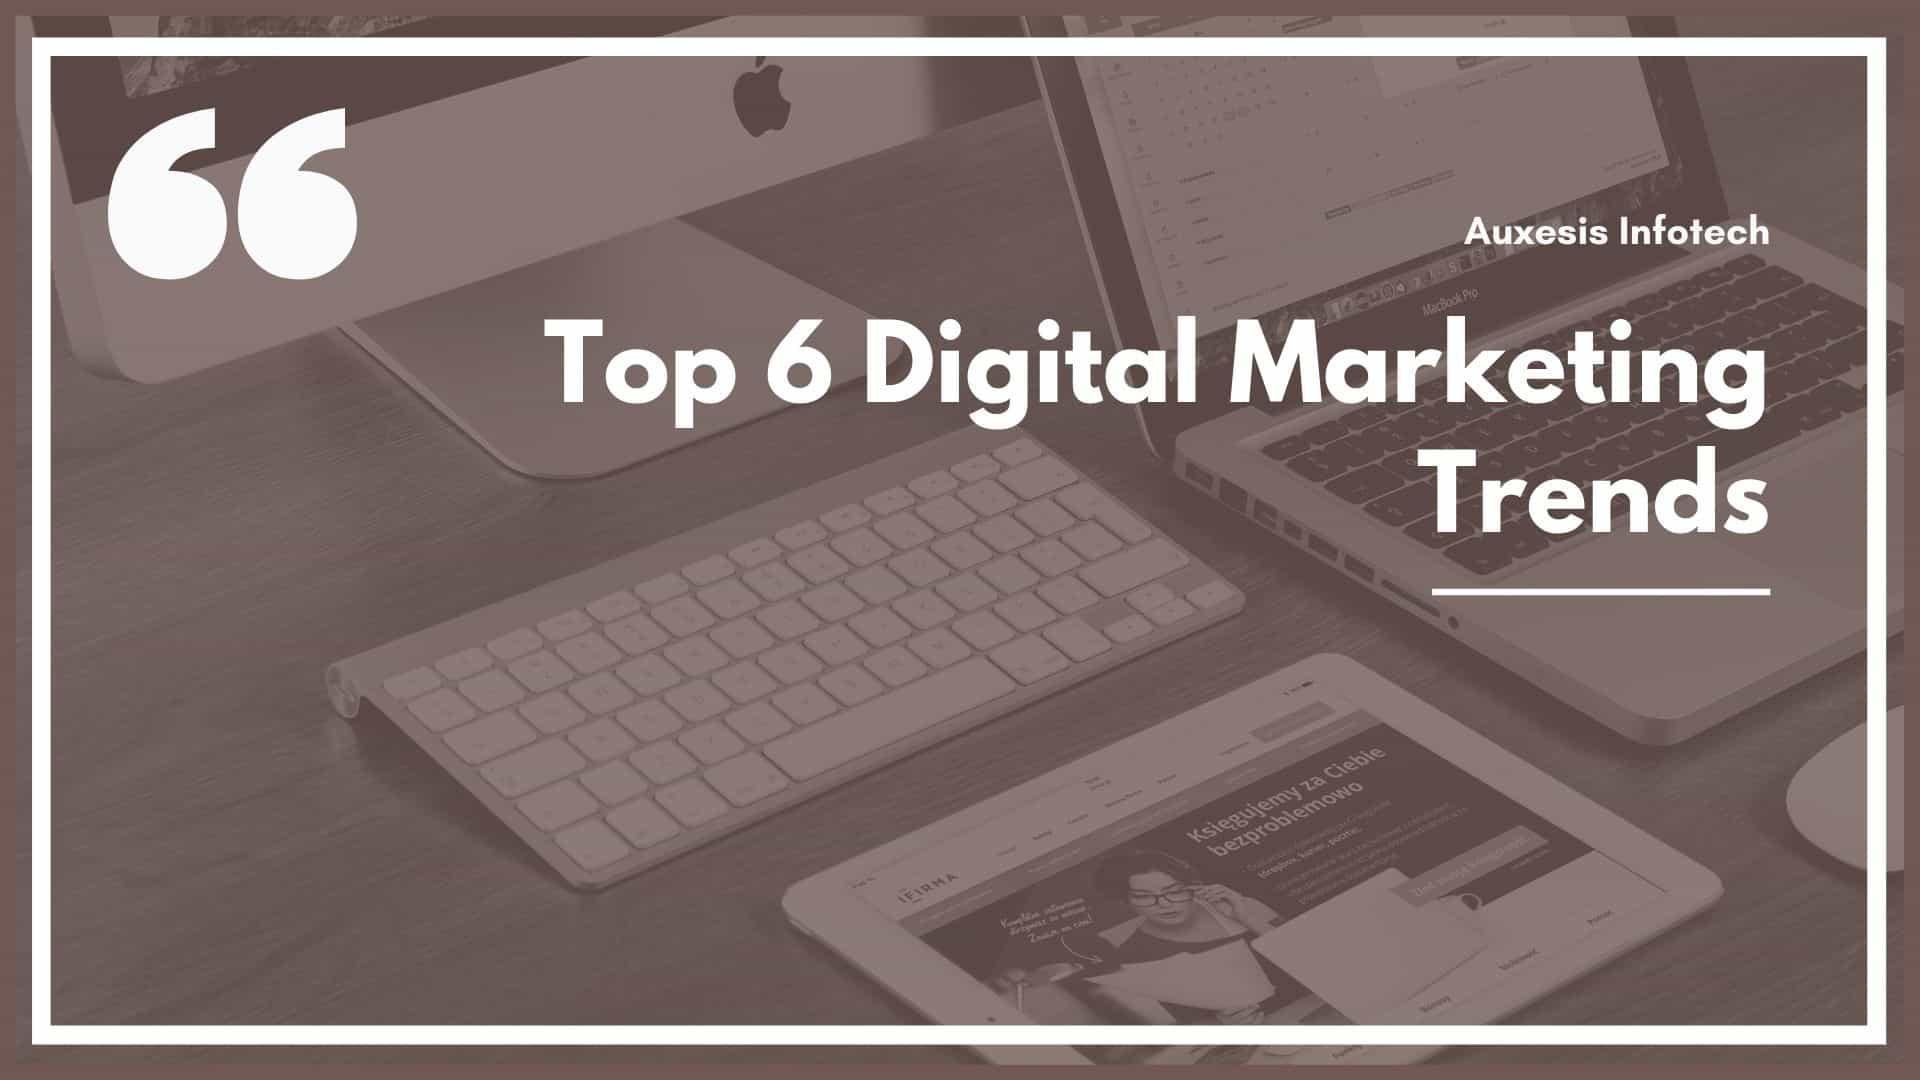 Top 6 Digital Marketing Trends